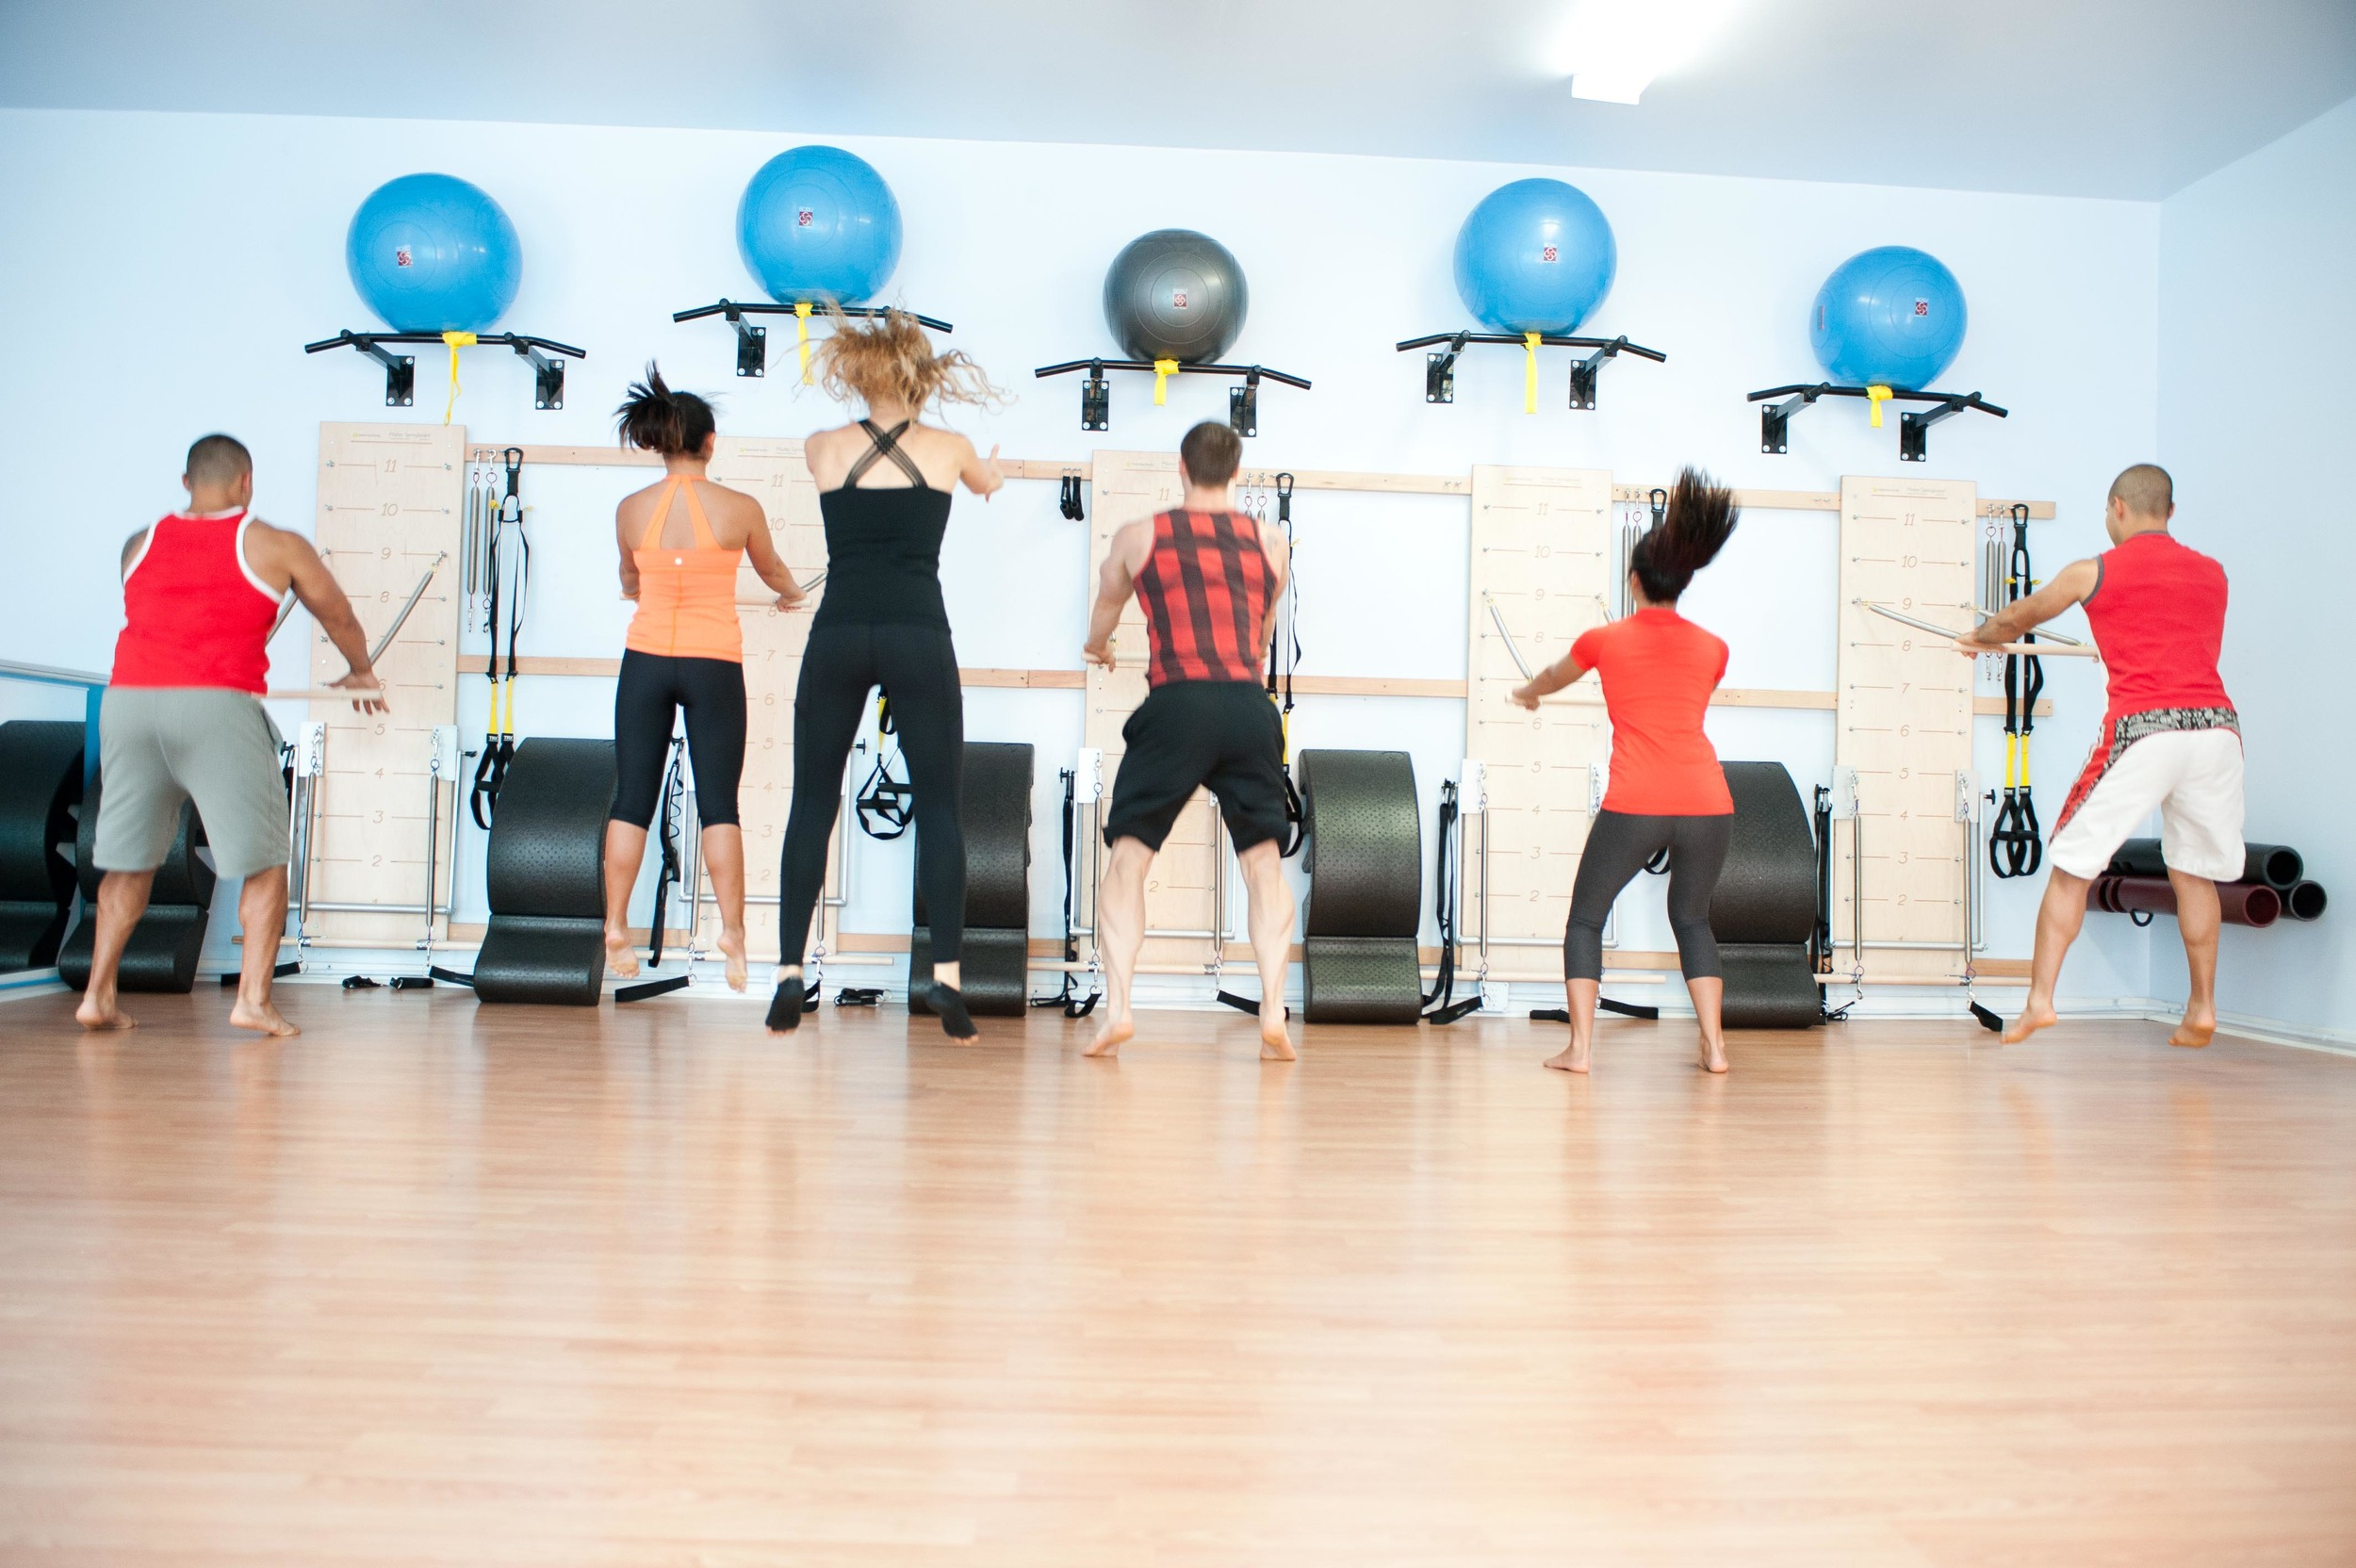 Group Fitness Information Rates Bodyfi Simple Circuit Training Dsc 8644